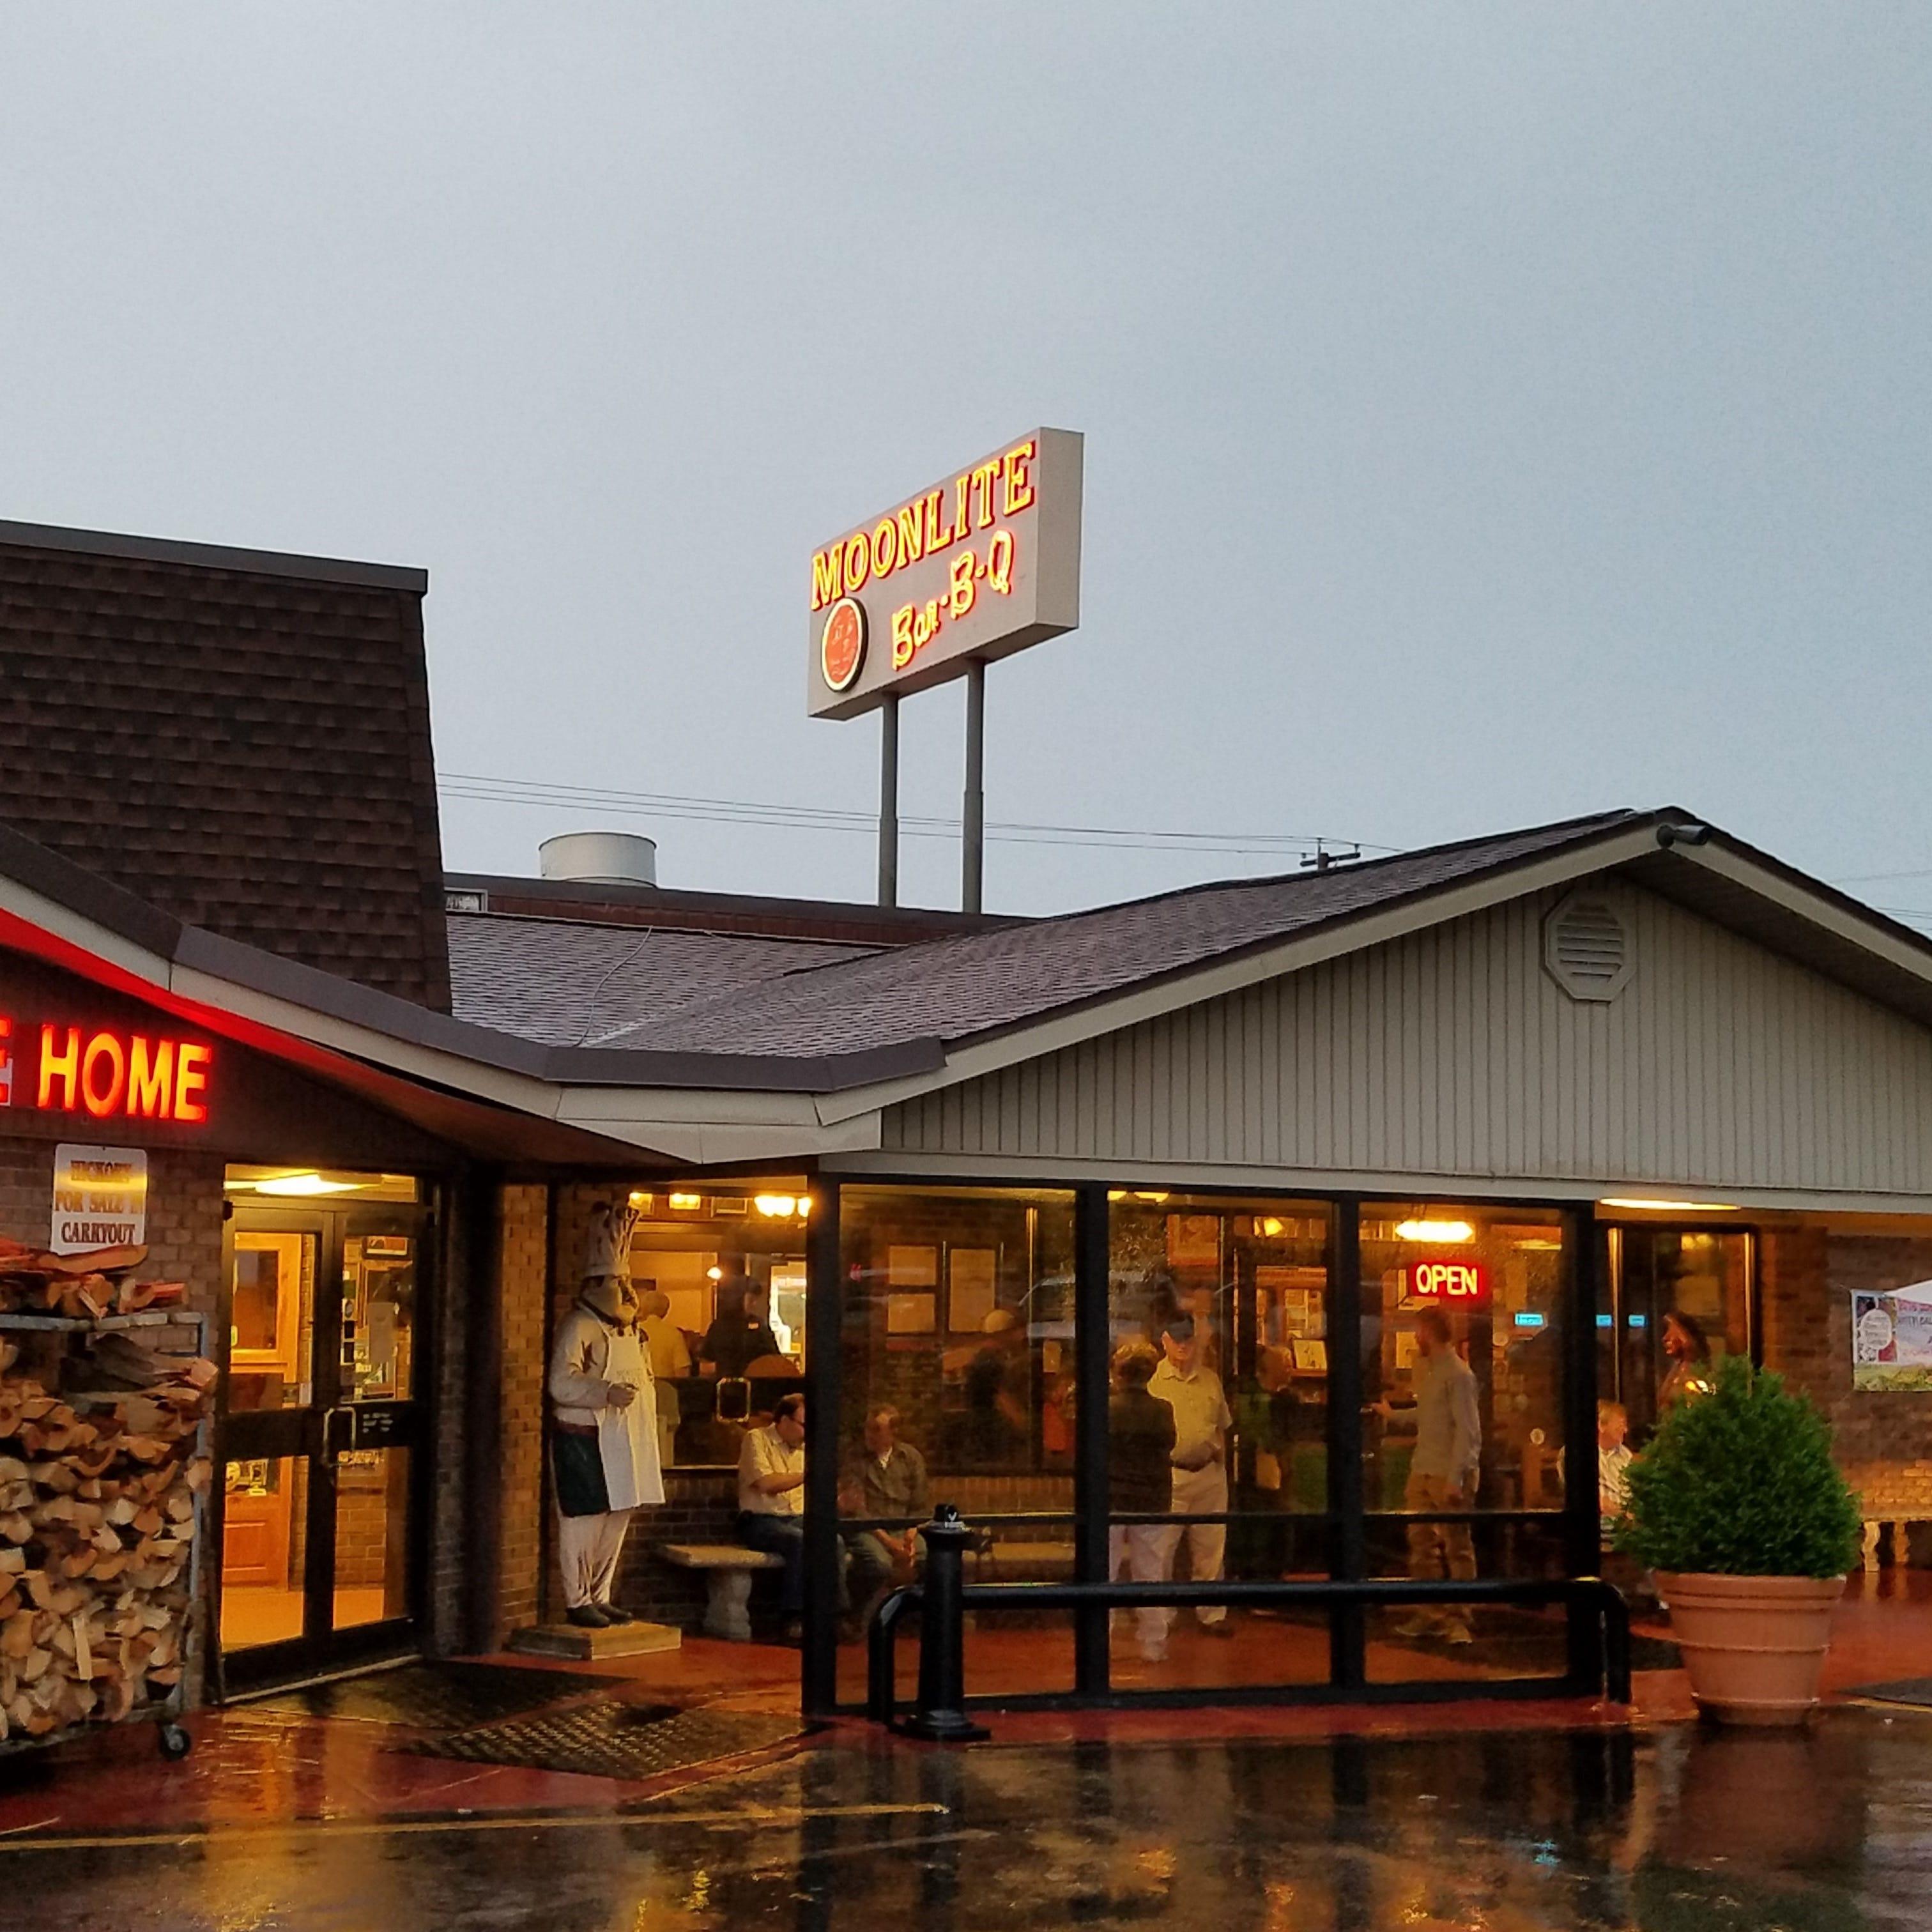 Moonlite Bar-B-Q not opening Evansville location